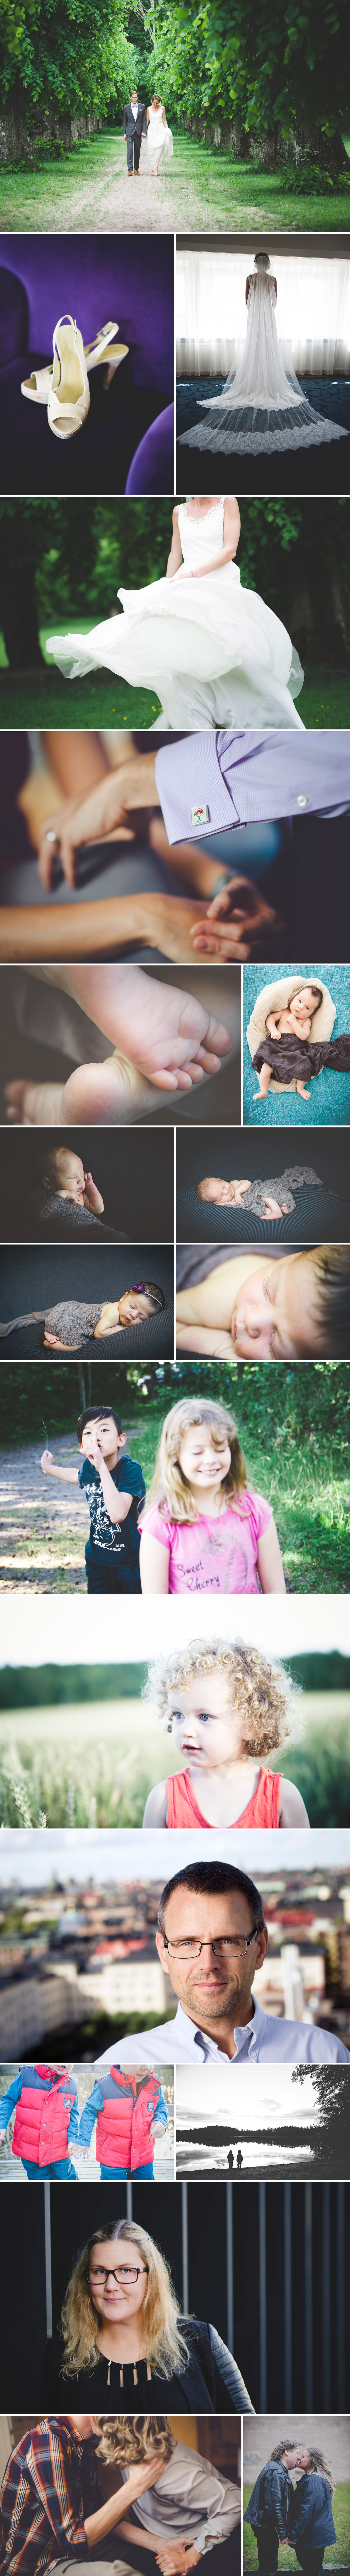 Playful Heart, Beloved, Moment design, familjefoto, familjefotograf, barnfoto, barnfotograf, syskon, syskonfoto, parfoto, familjefotograf, kärlek, stockholm, enköping, uppsala